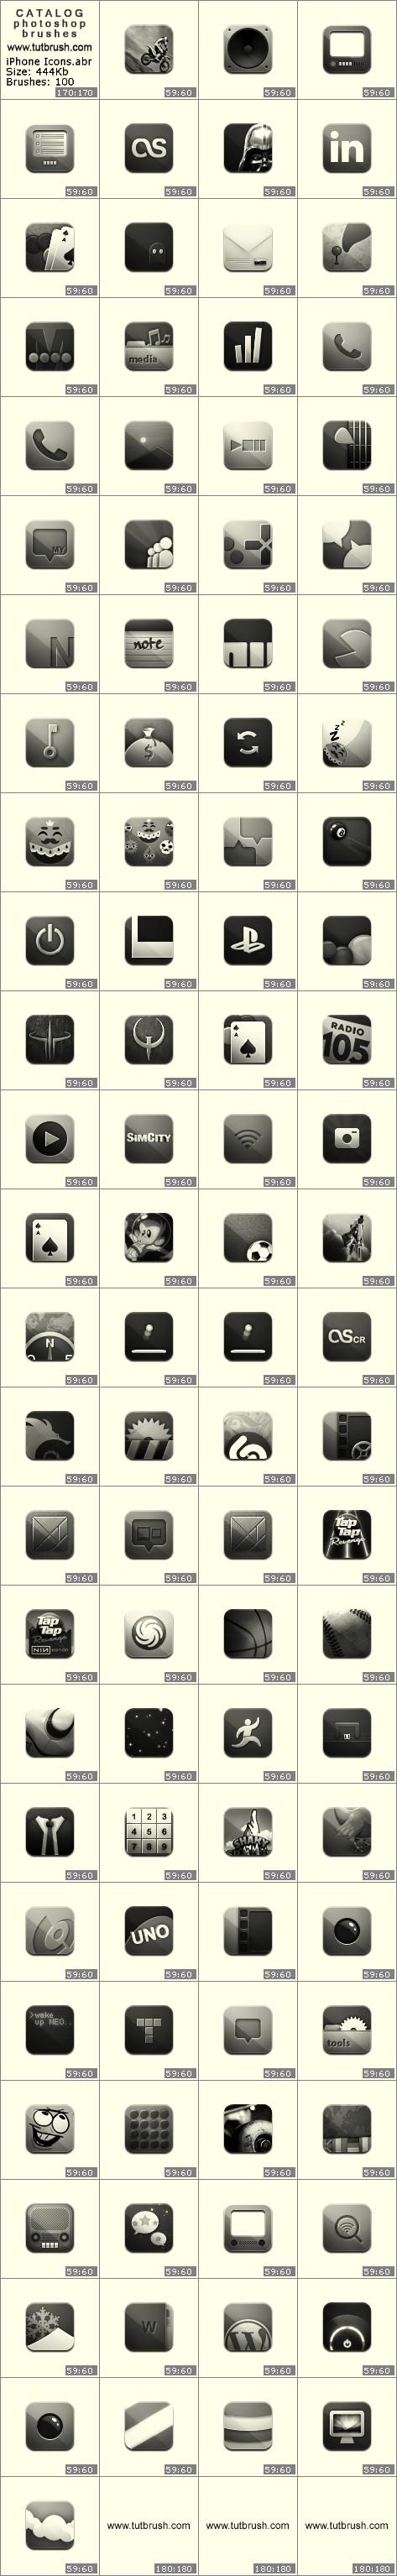 Кисти фотошоп iPhone иконки